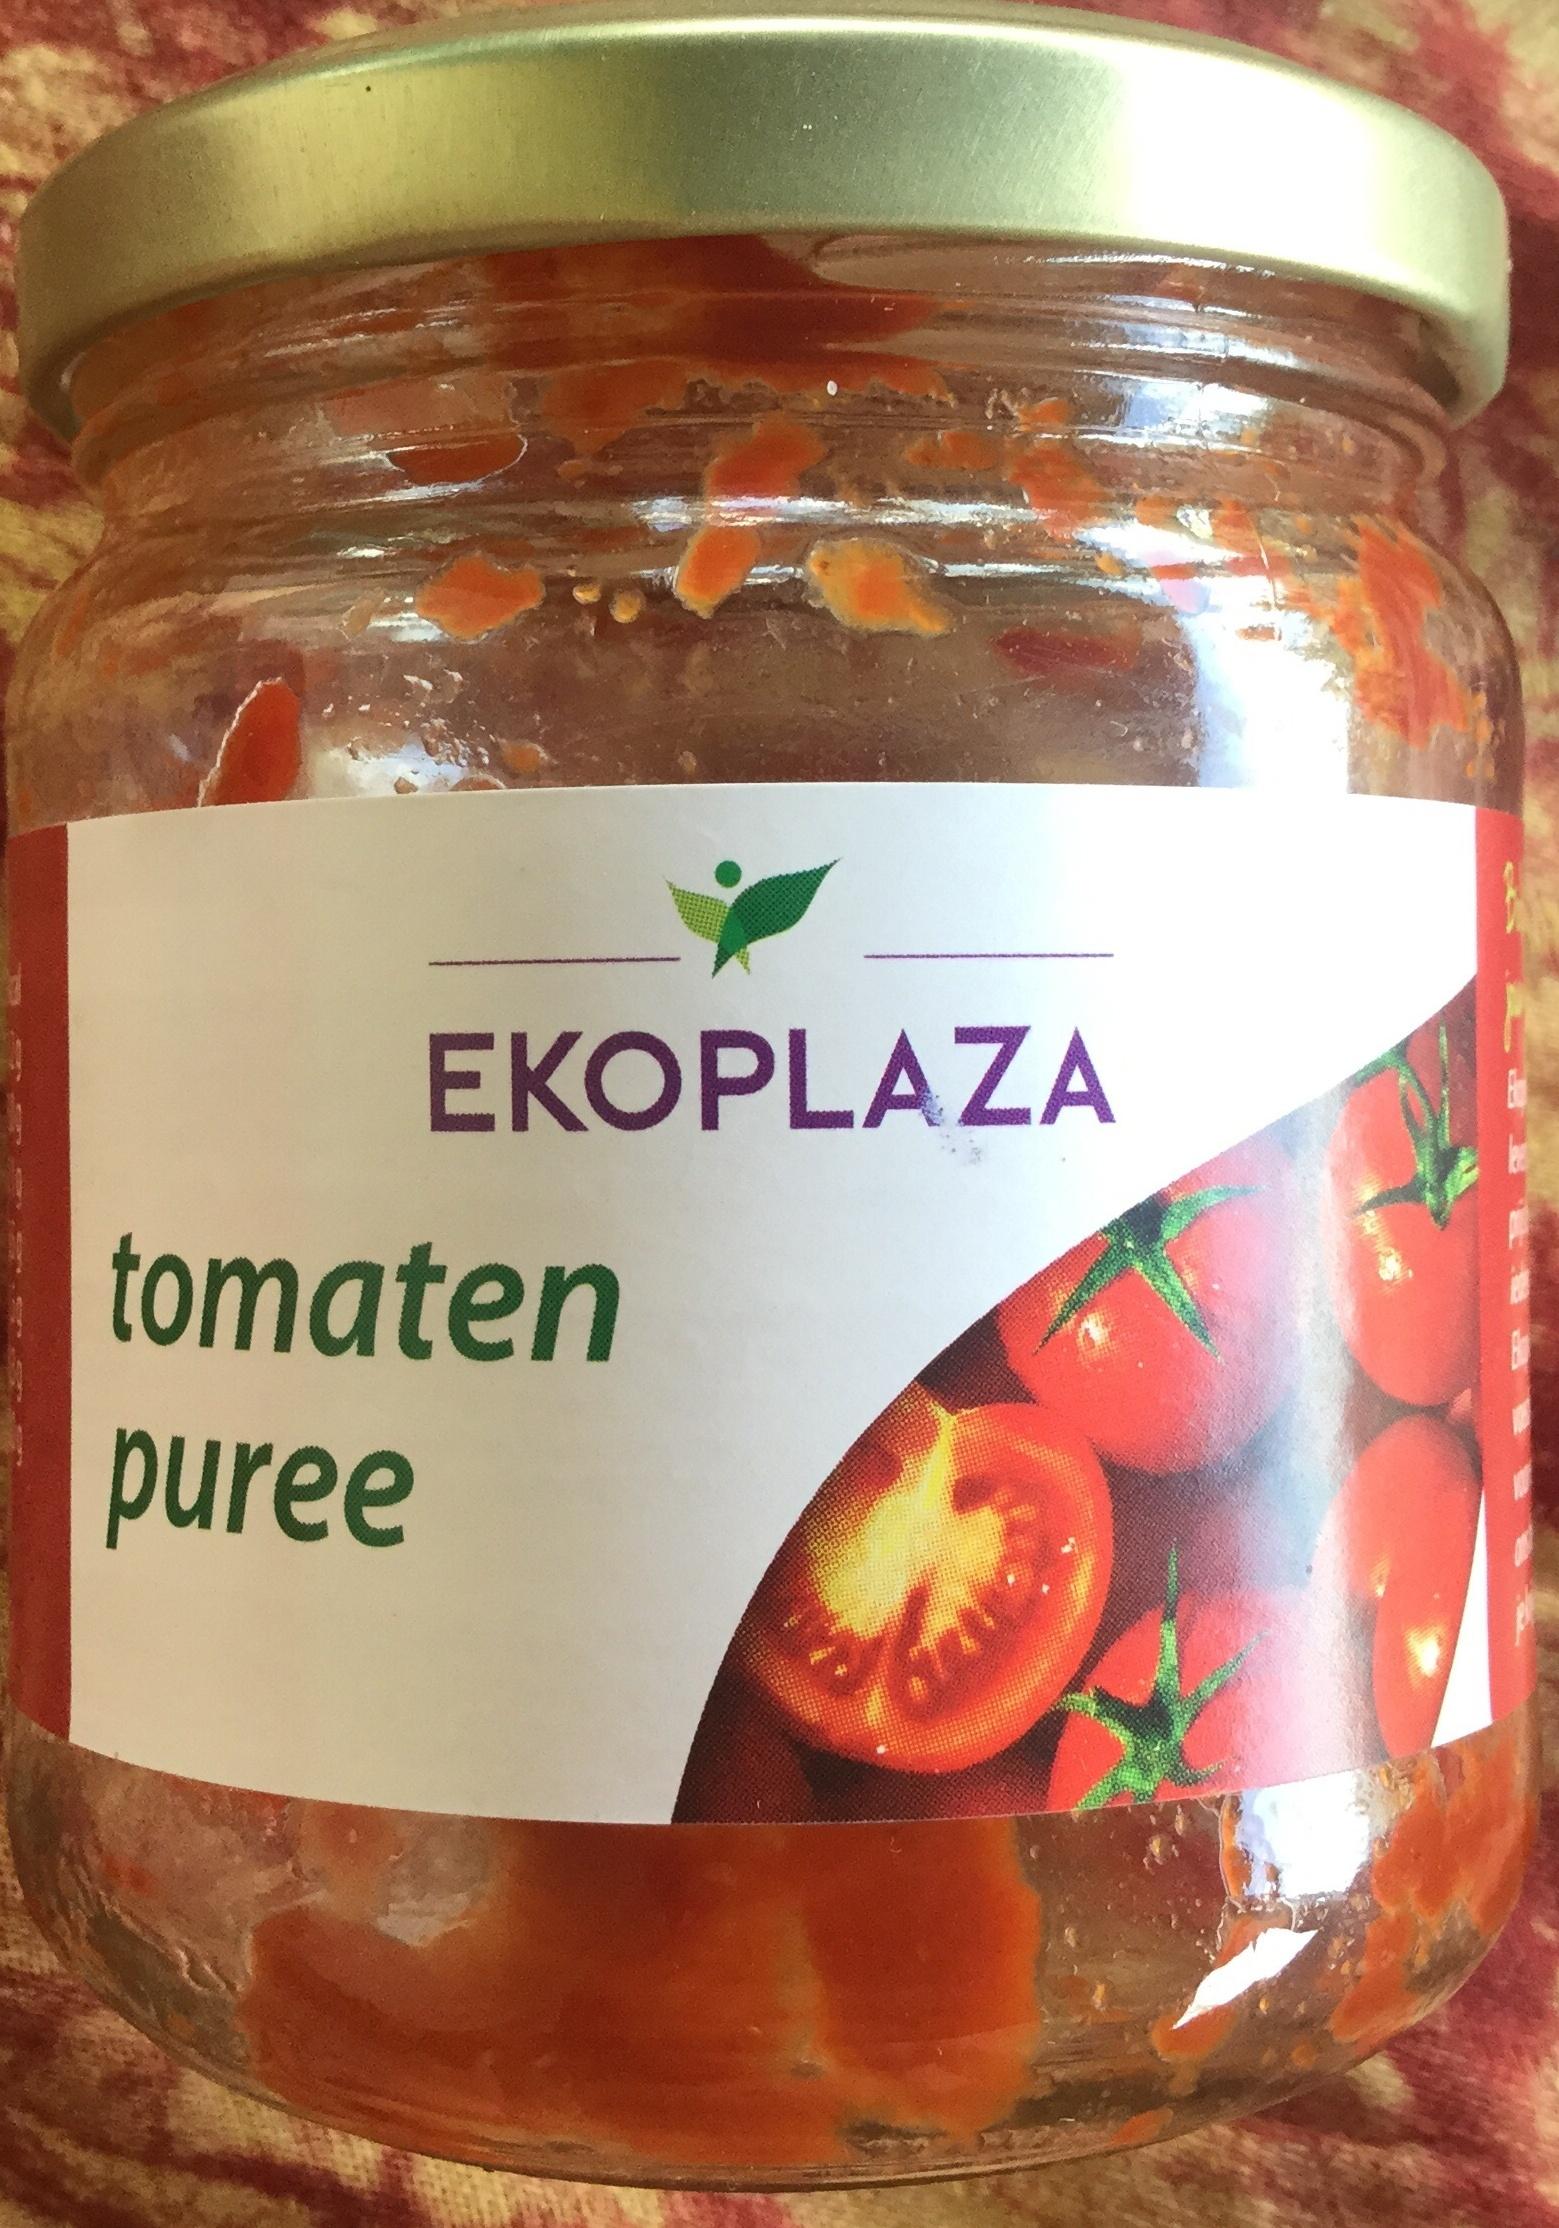 Tomatenpuree - Product - nl